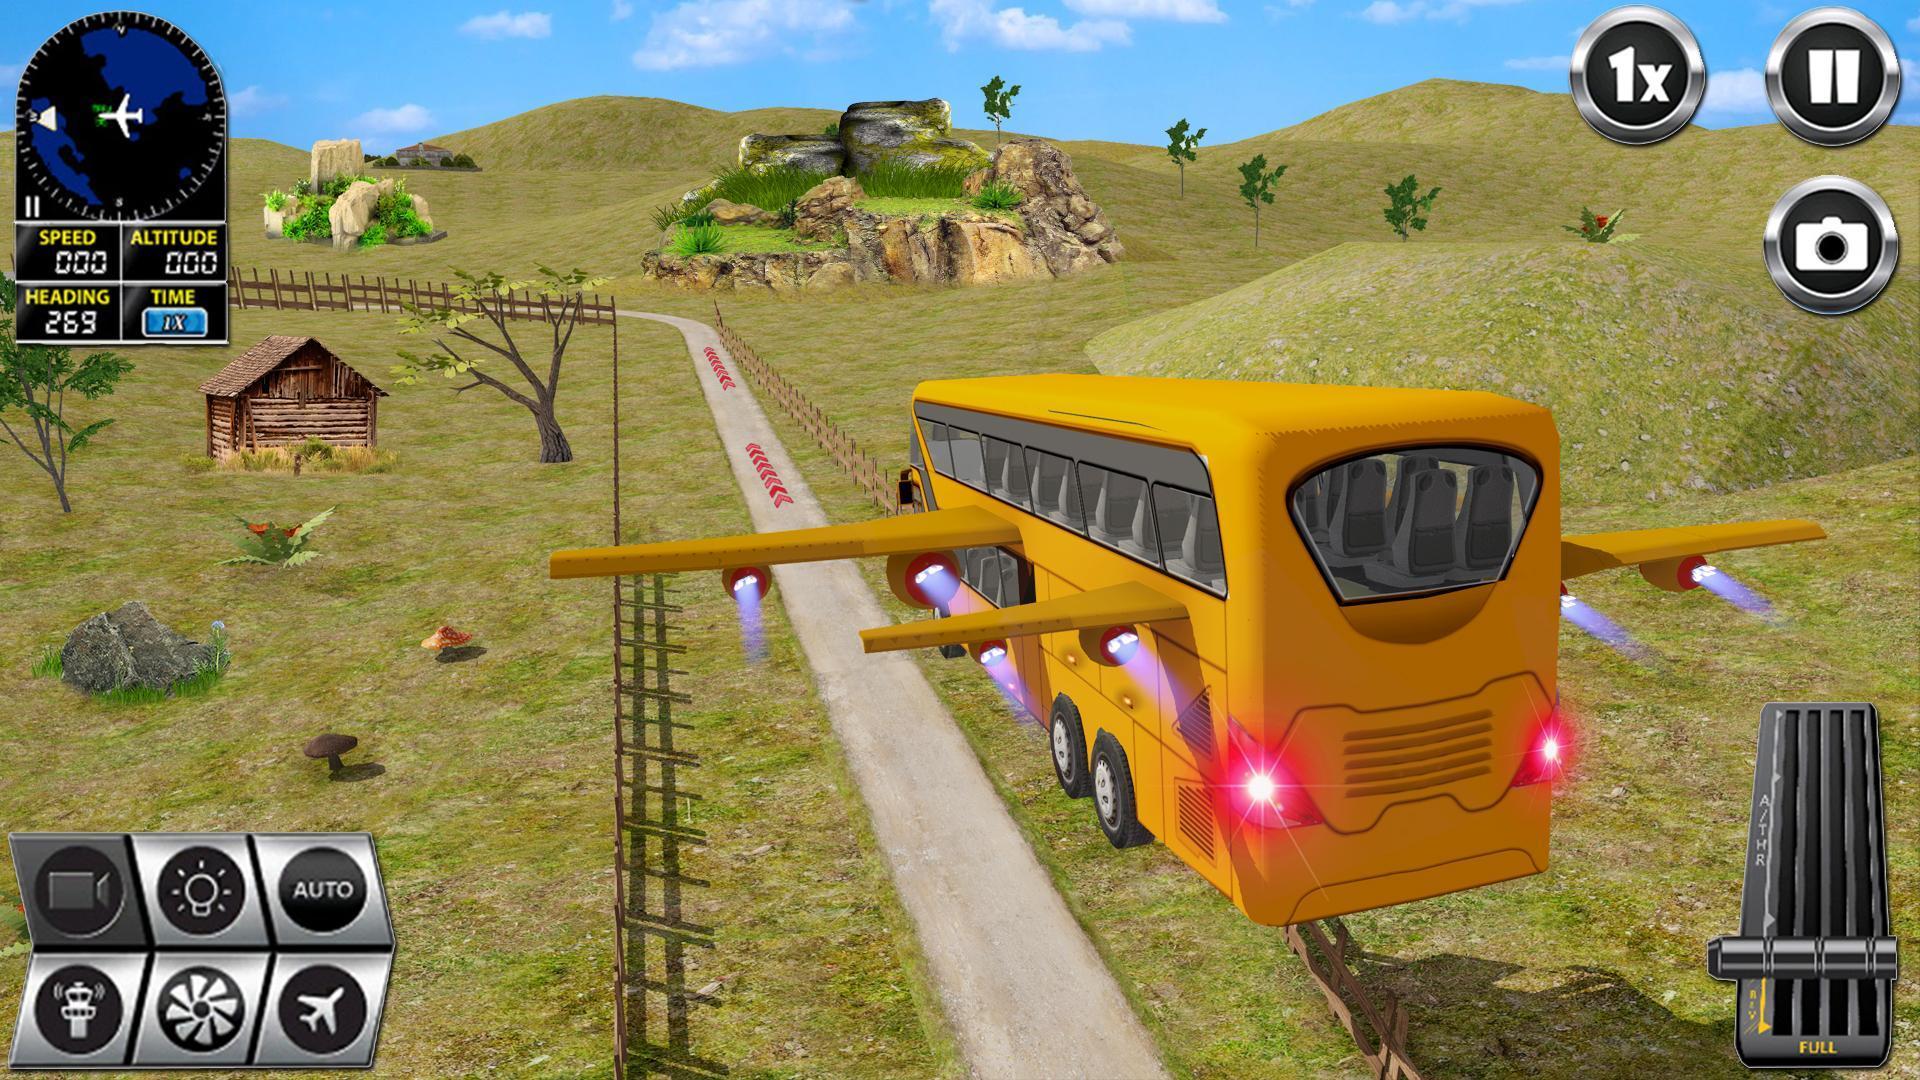 Flying Bus Driving simulator 2019: Free Bus Games 2.8 Screenshot 6